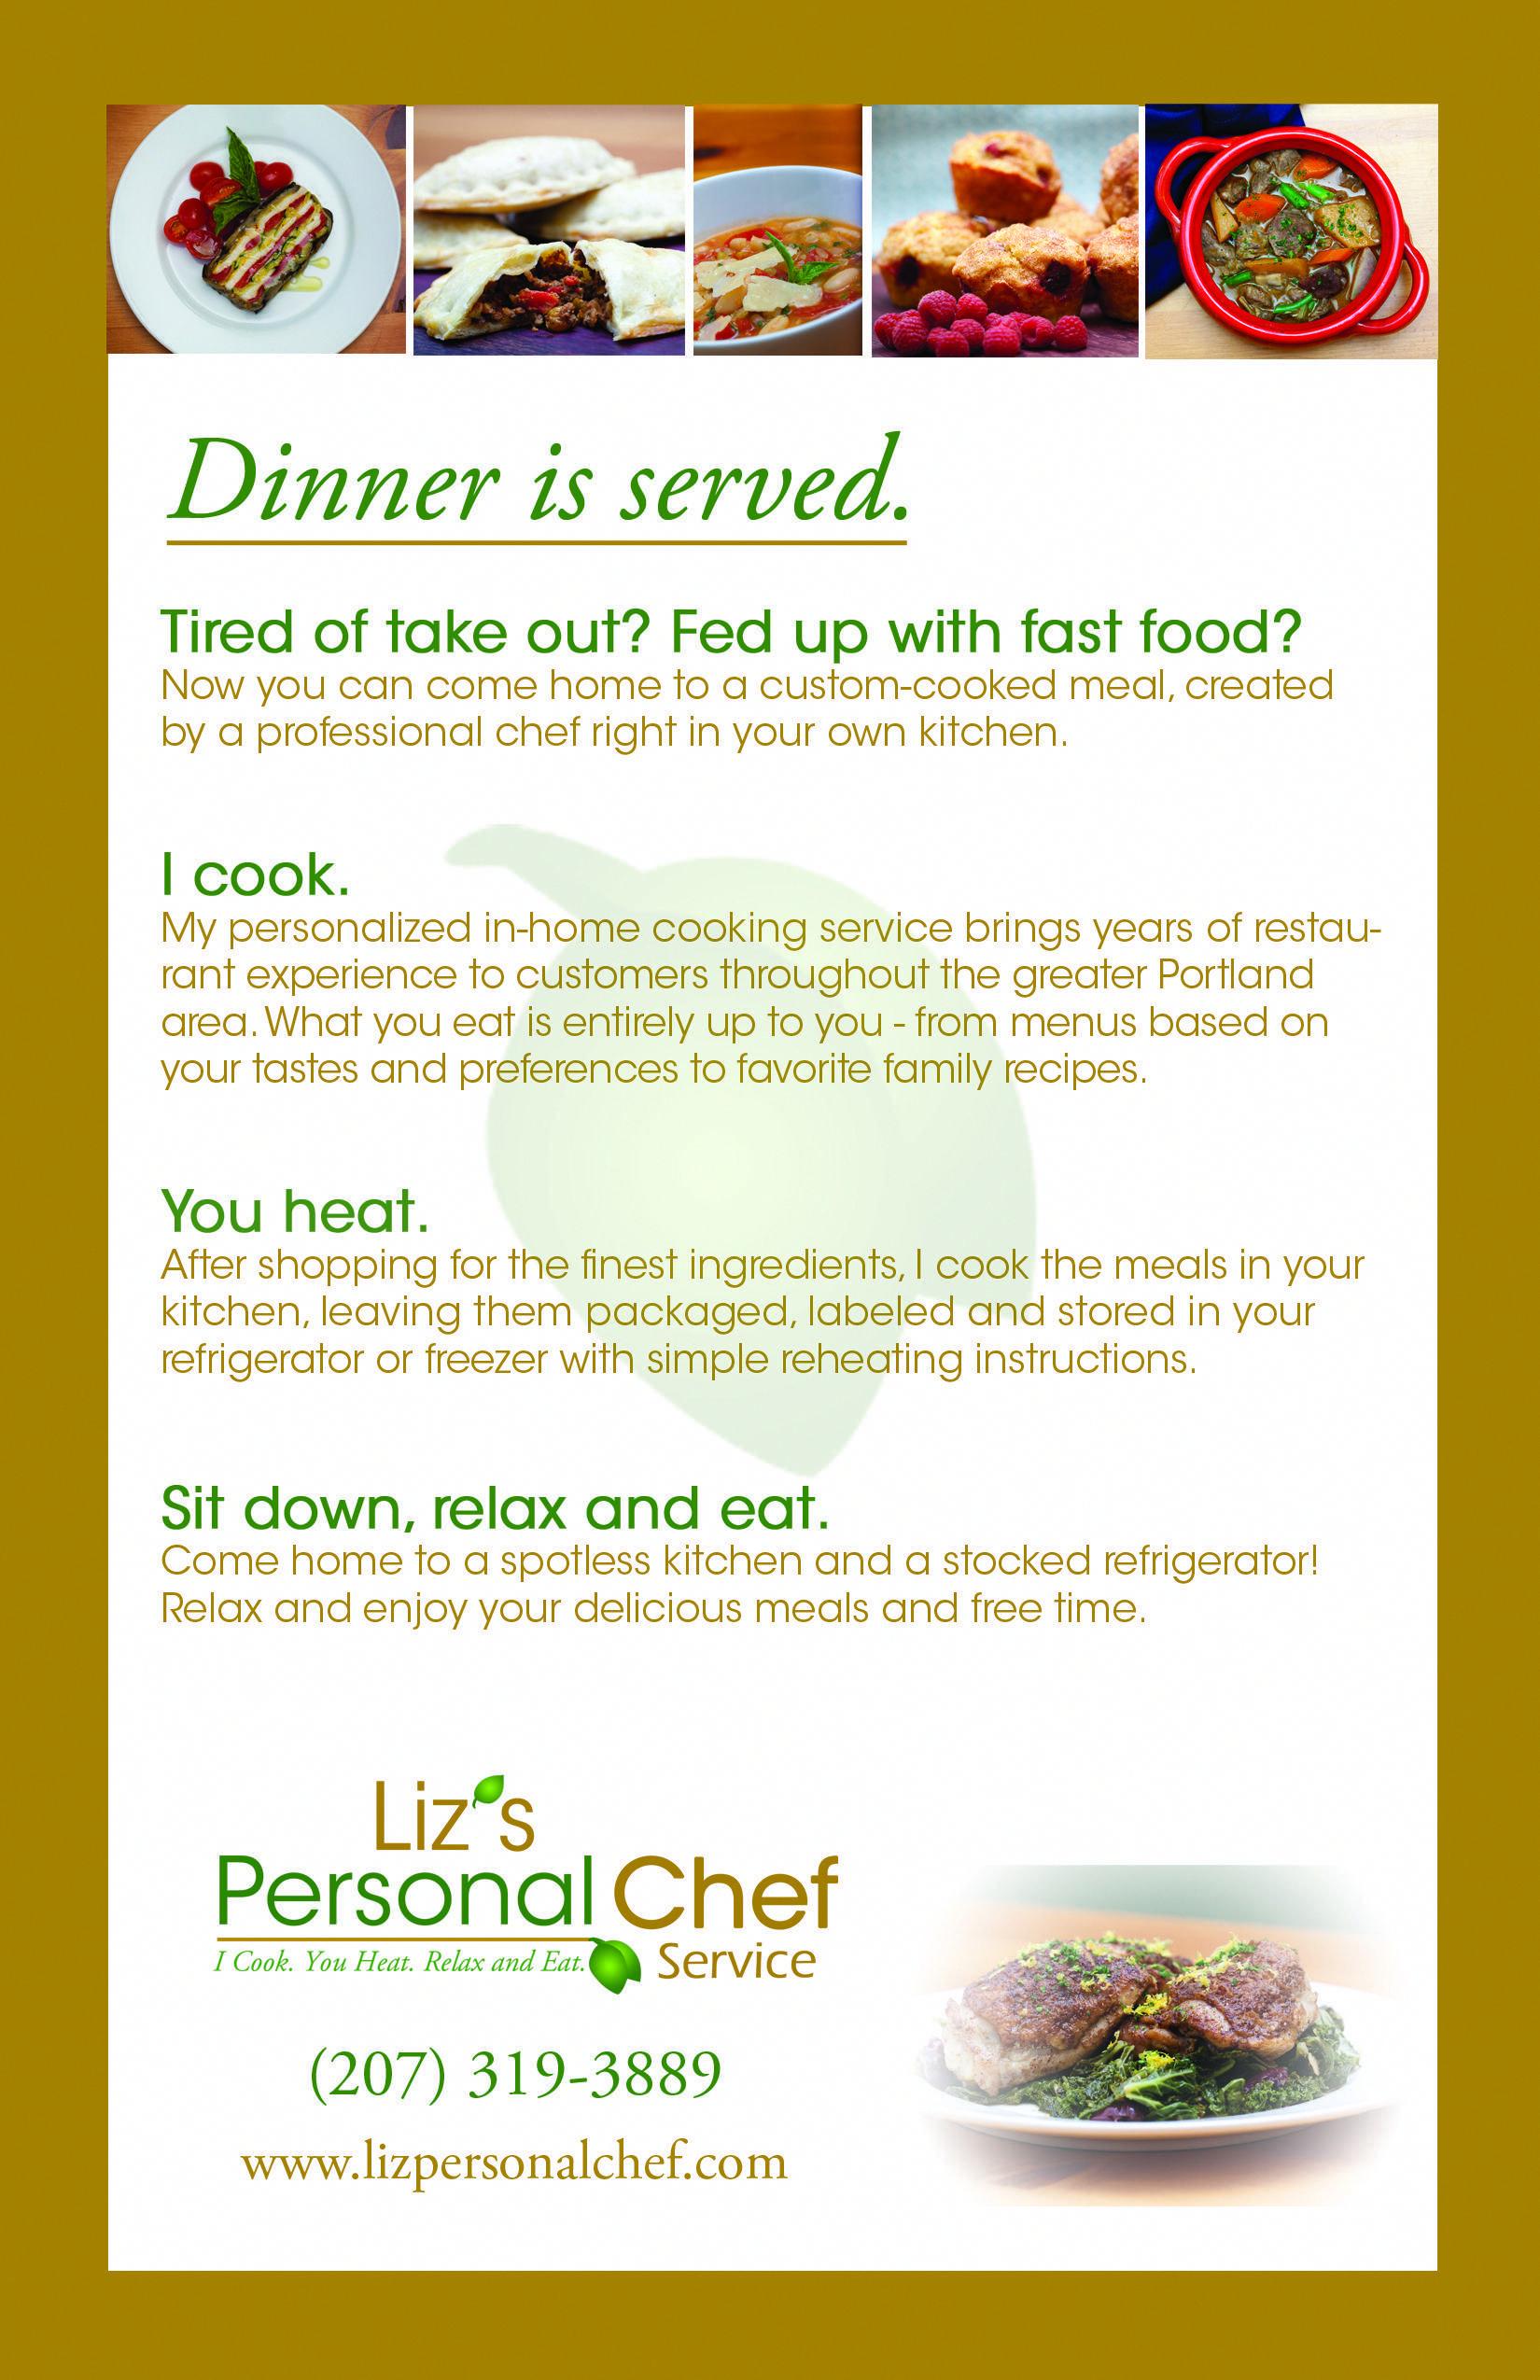 5monthbabyfoodtipsintamil Key 1801659120 Gardeningtipsforseptember Personal Chef Business Personal Chef Service Personal Chef